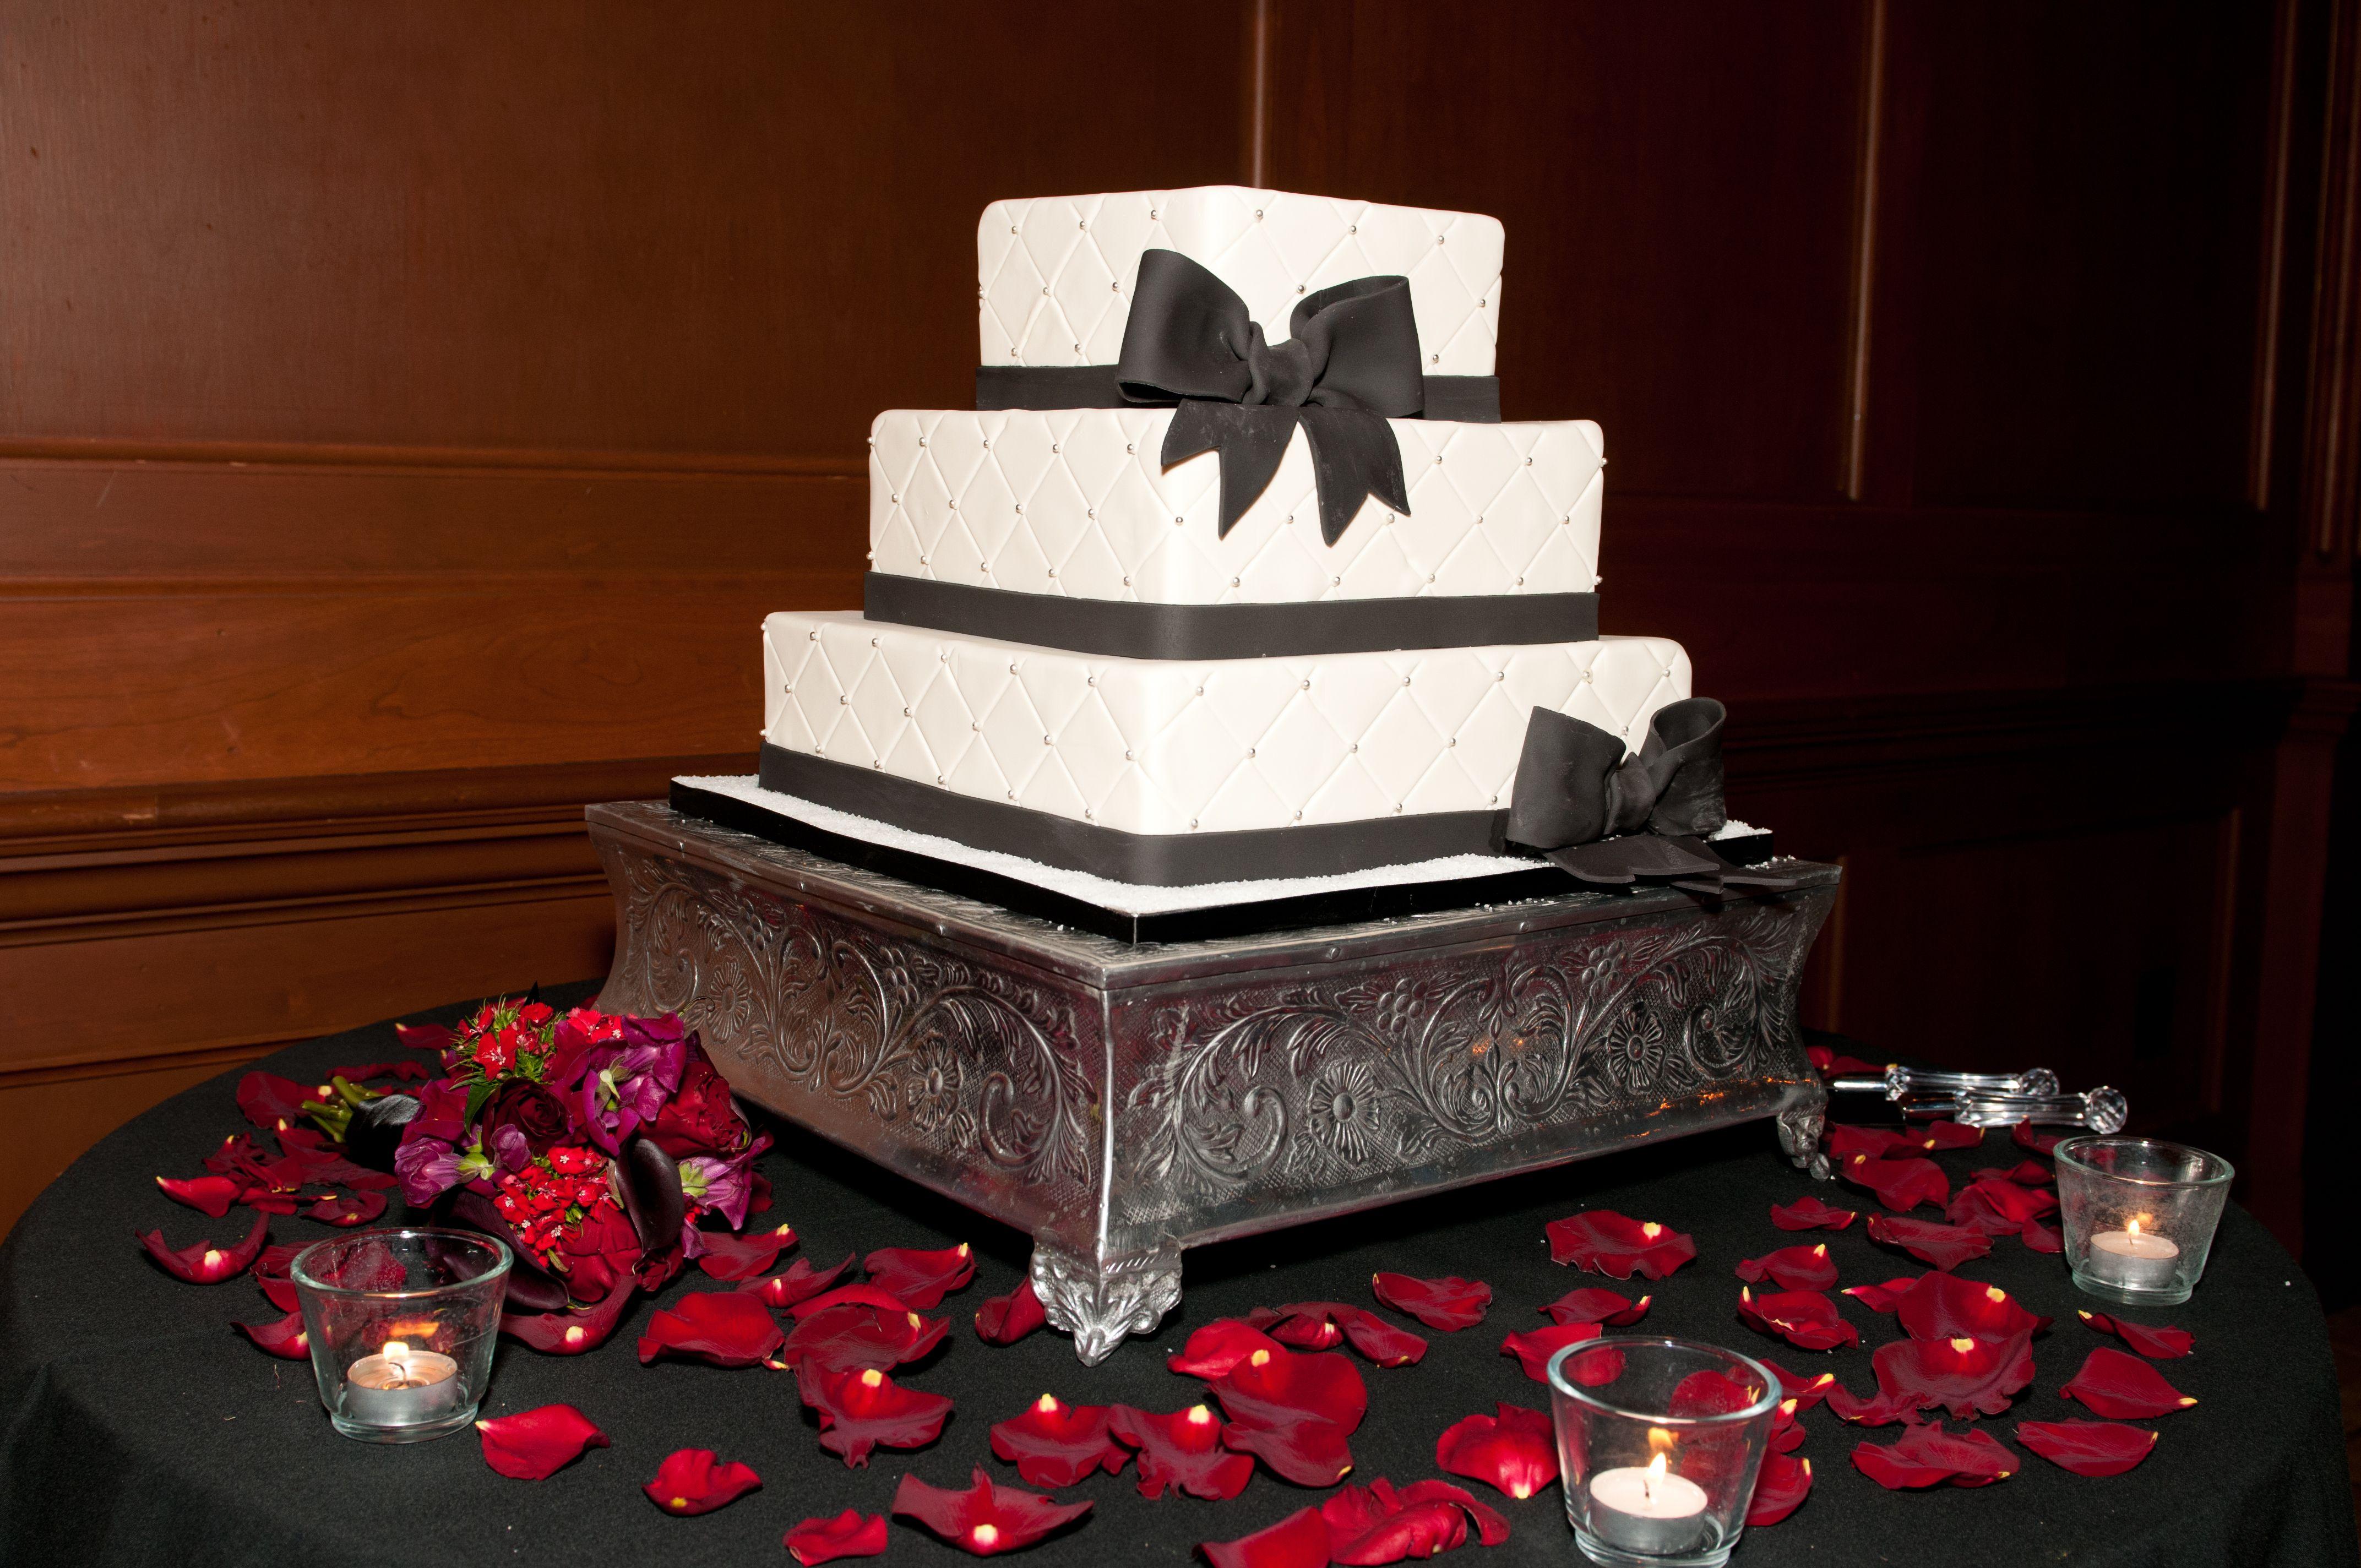 Black u0026 white wedding cake with white